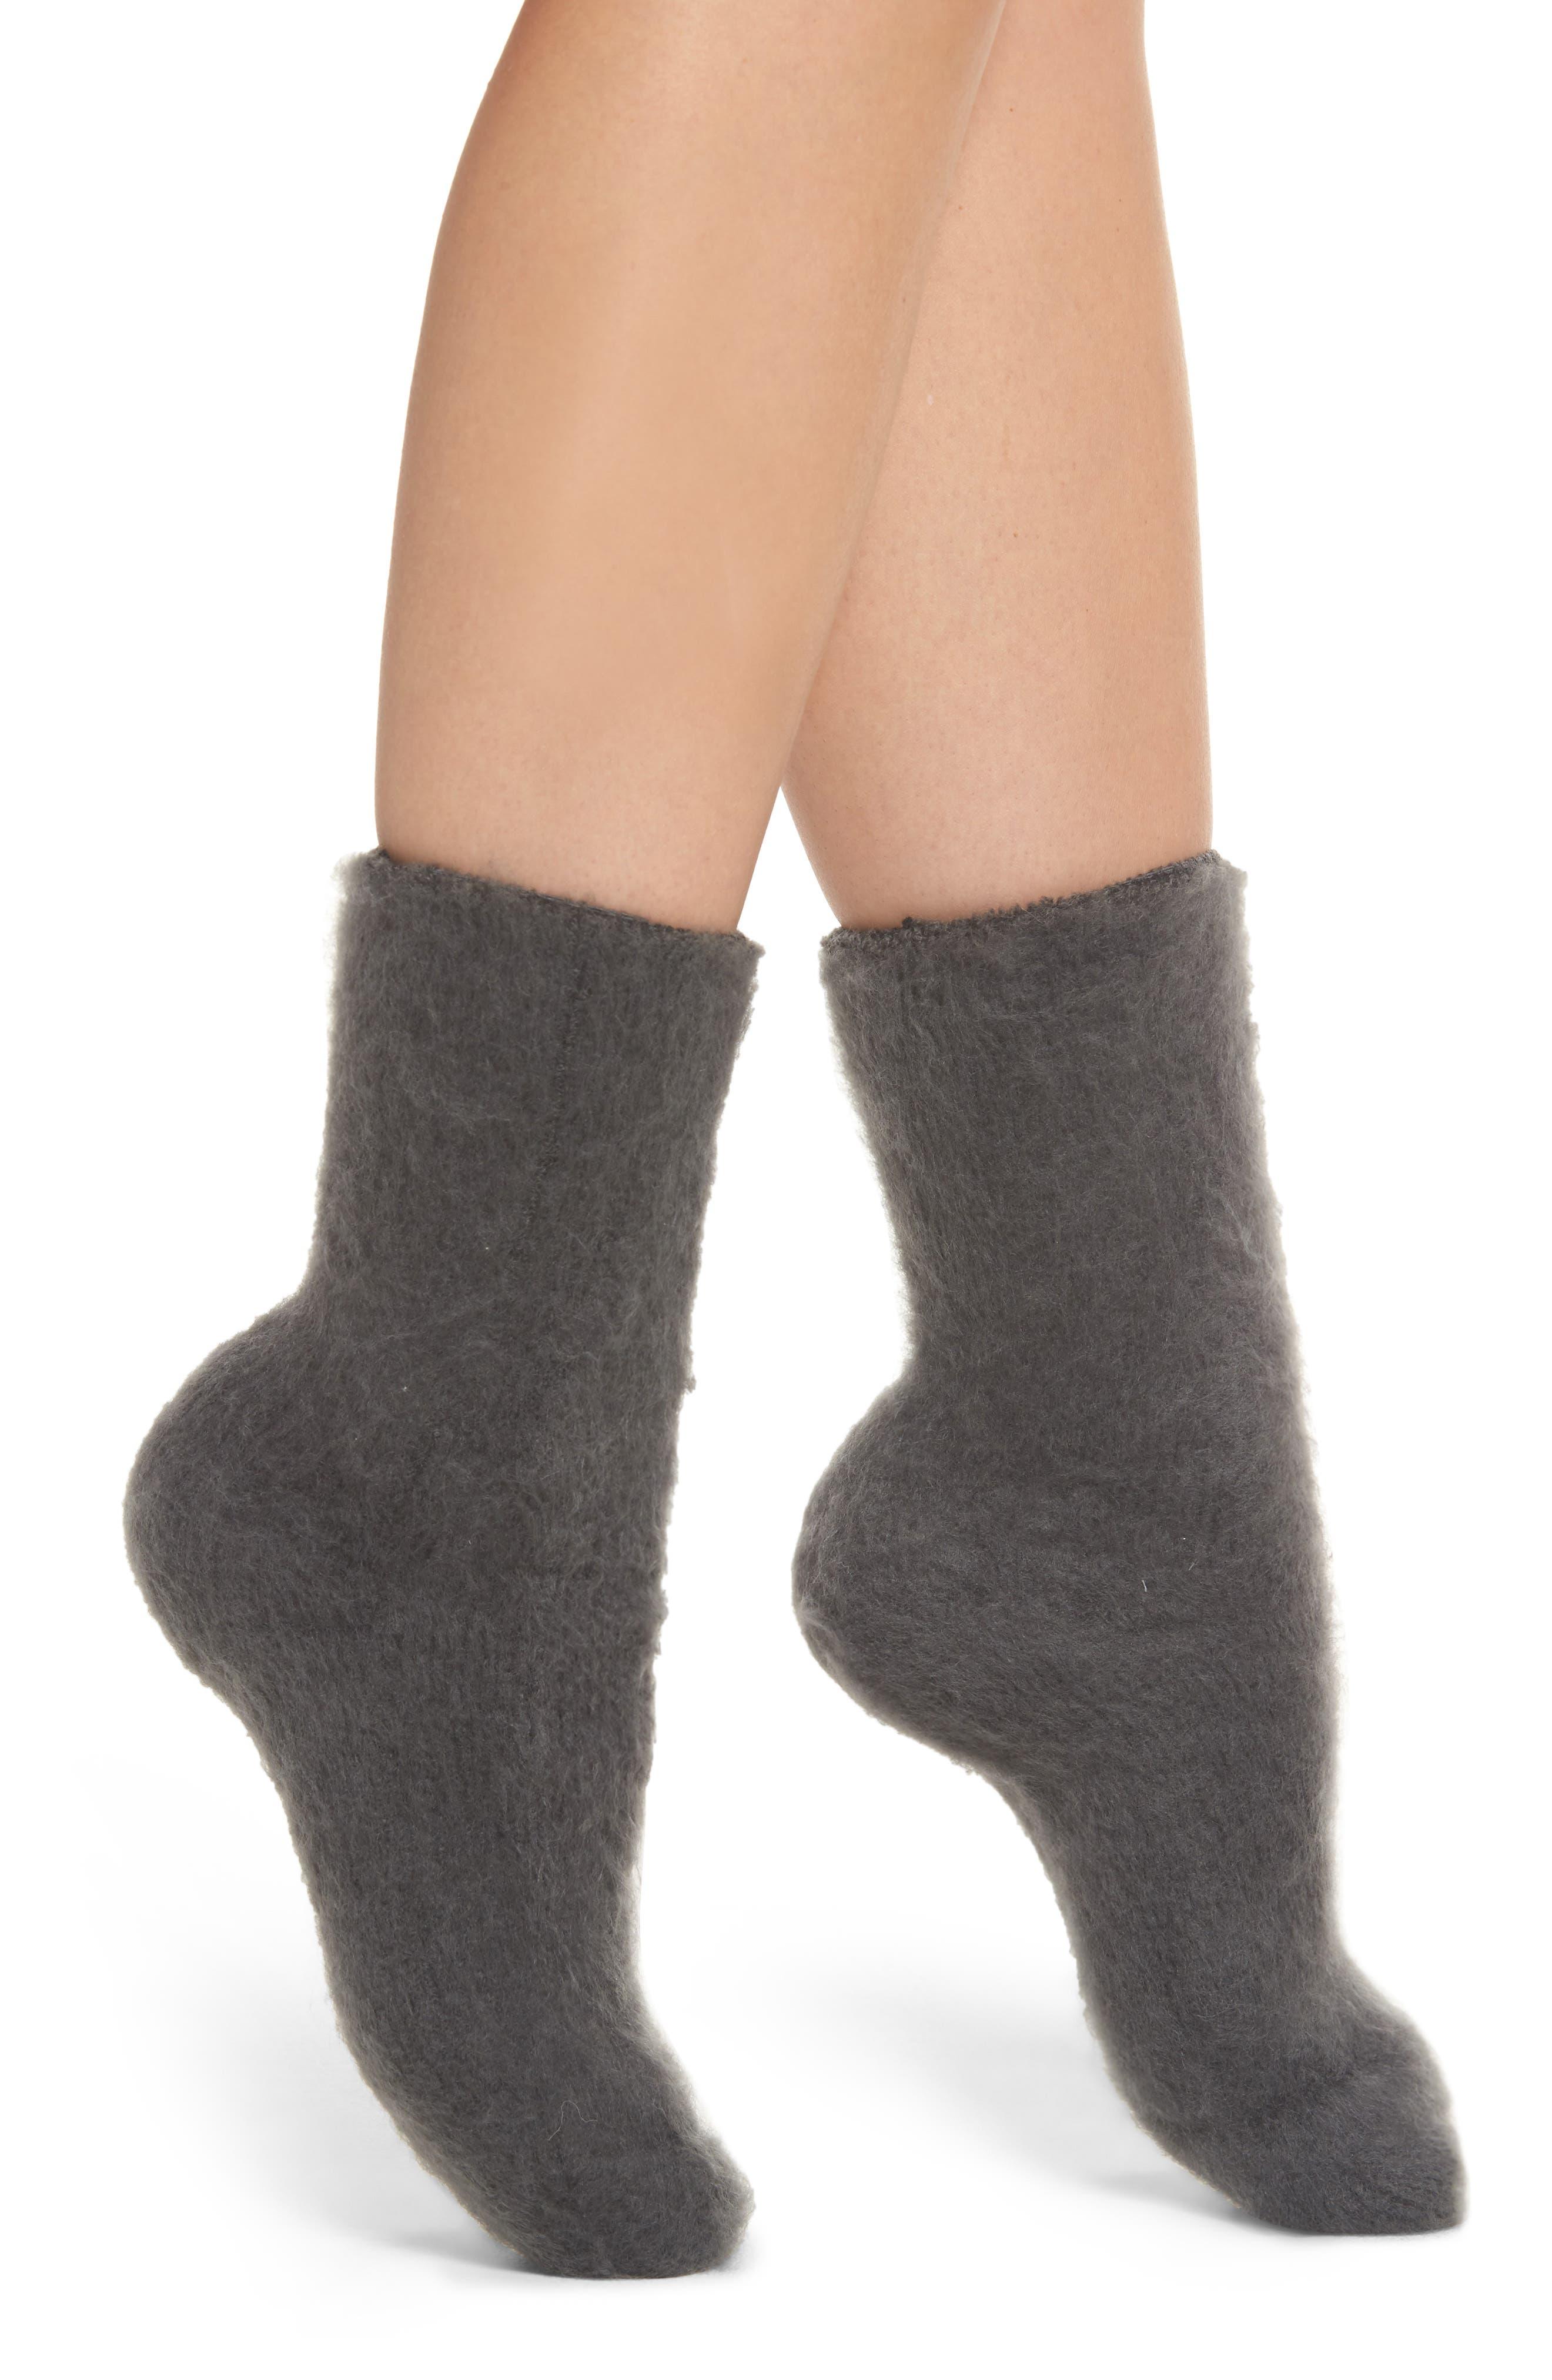 Winter Fog Socks,                             Main thumbnail 1, color,                             020